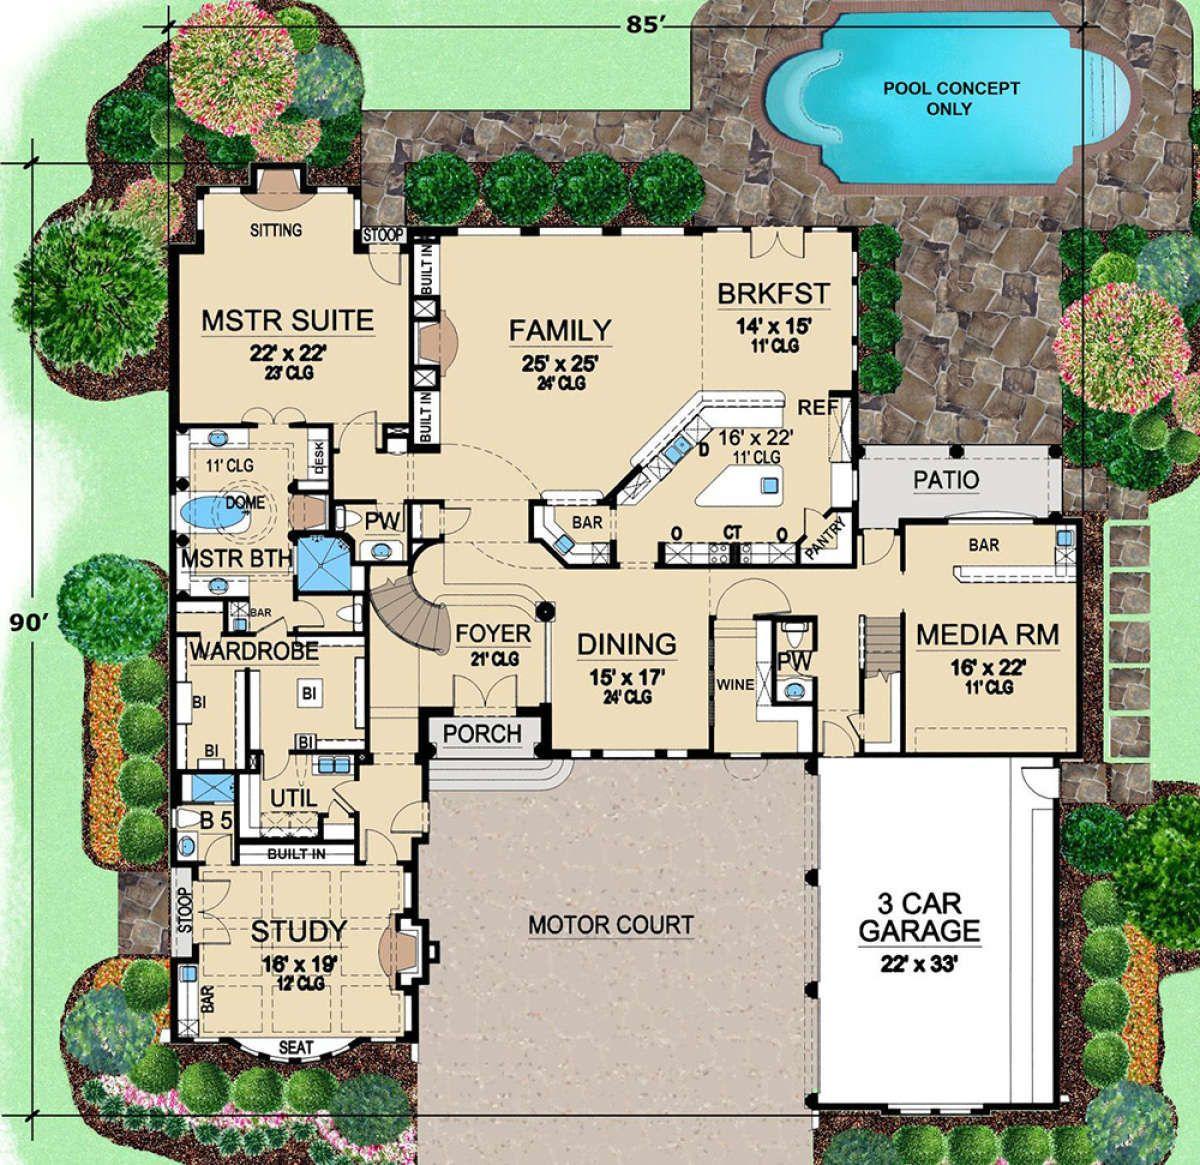 House Plan 5445 00317 Mediterranean Plan 5 956 Square Feet 3 Bedrooms 6 Bathrooms In 2021 Courtyard House Plans Monster House Plans House Plans